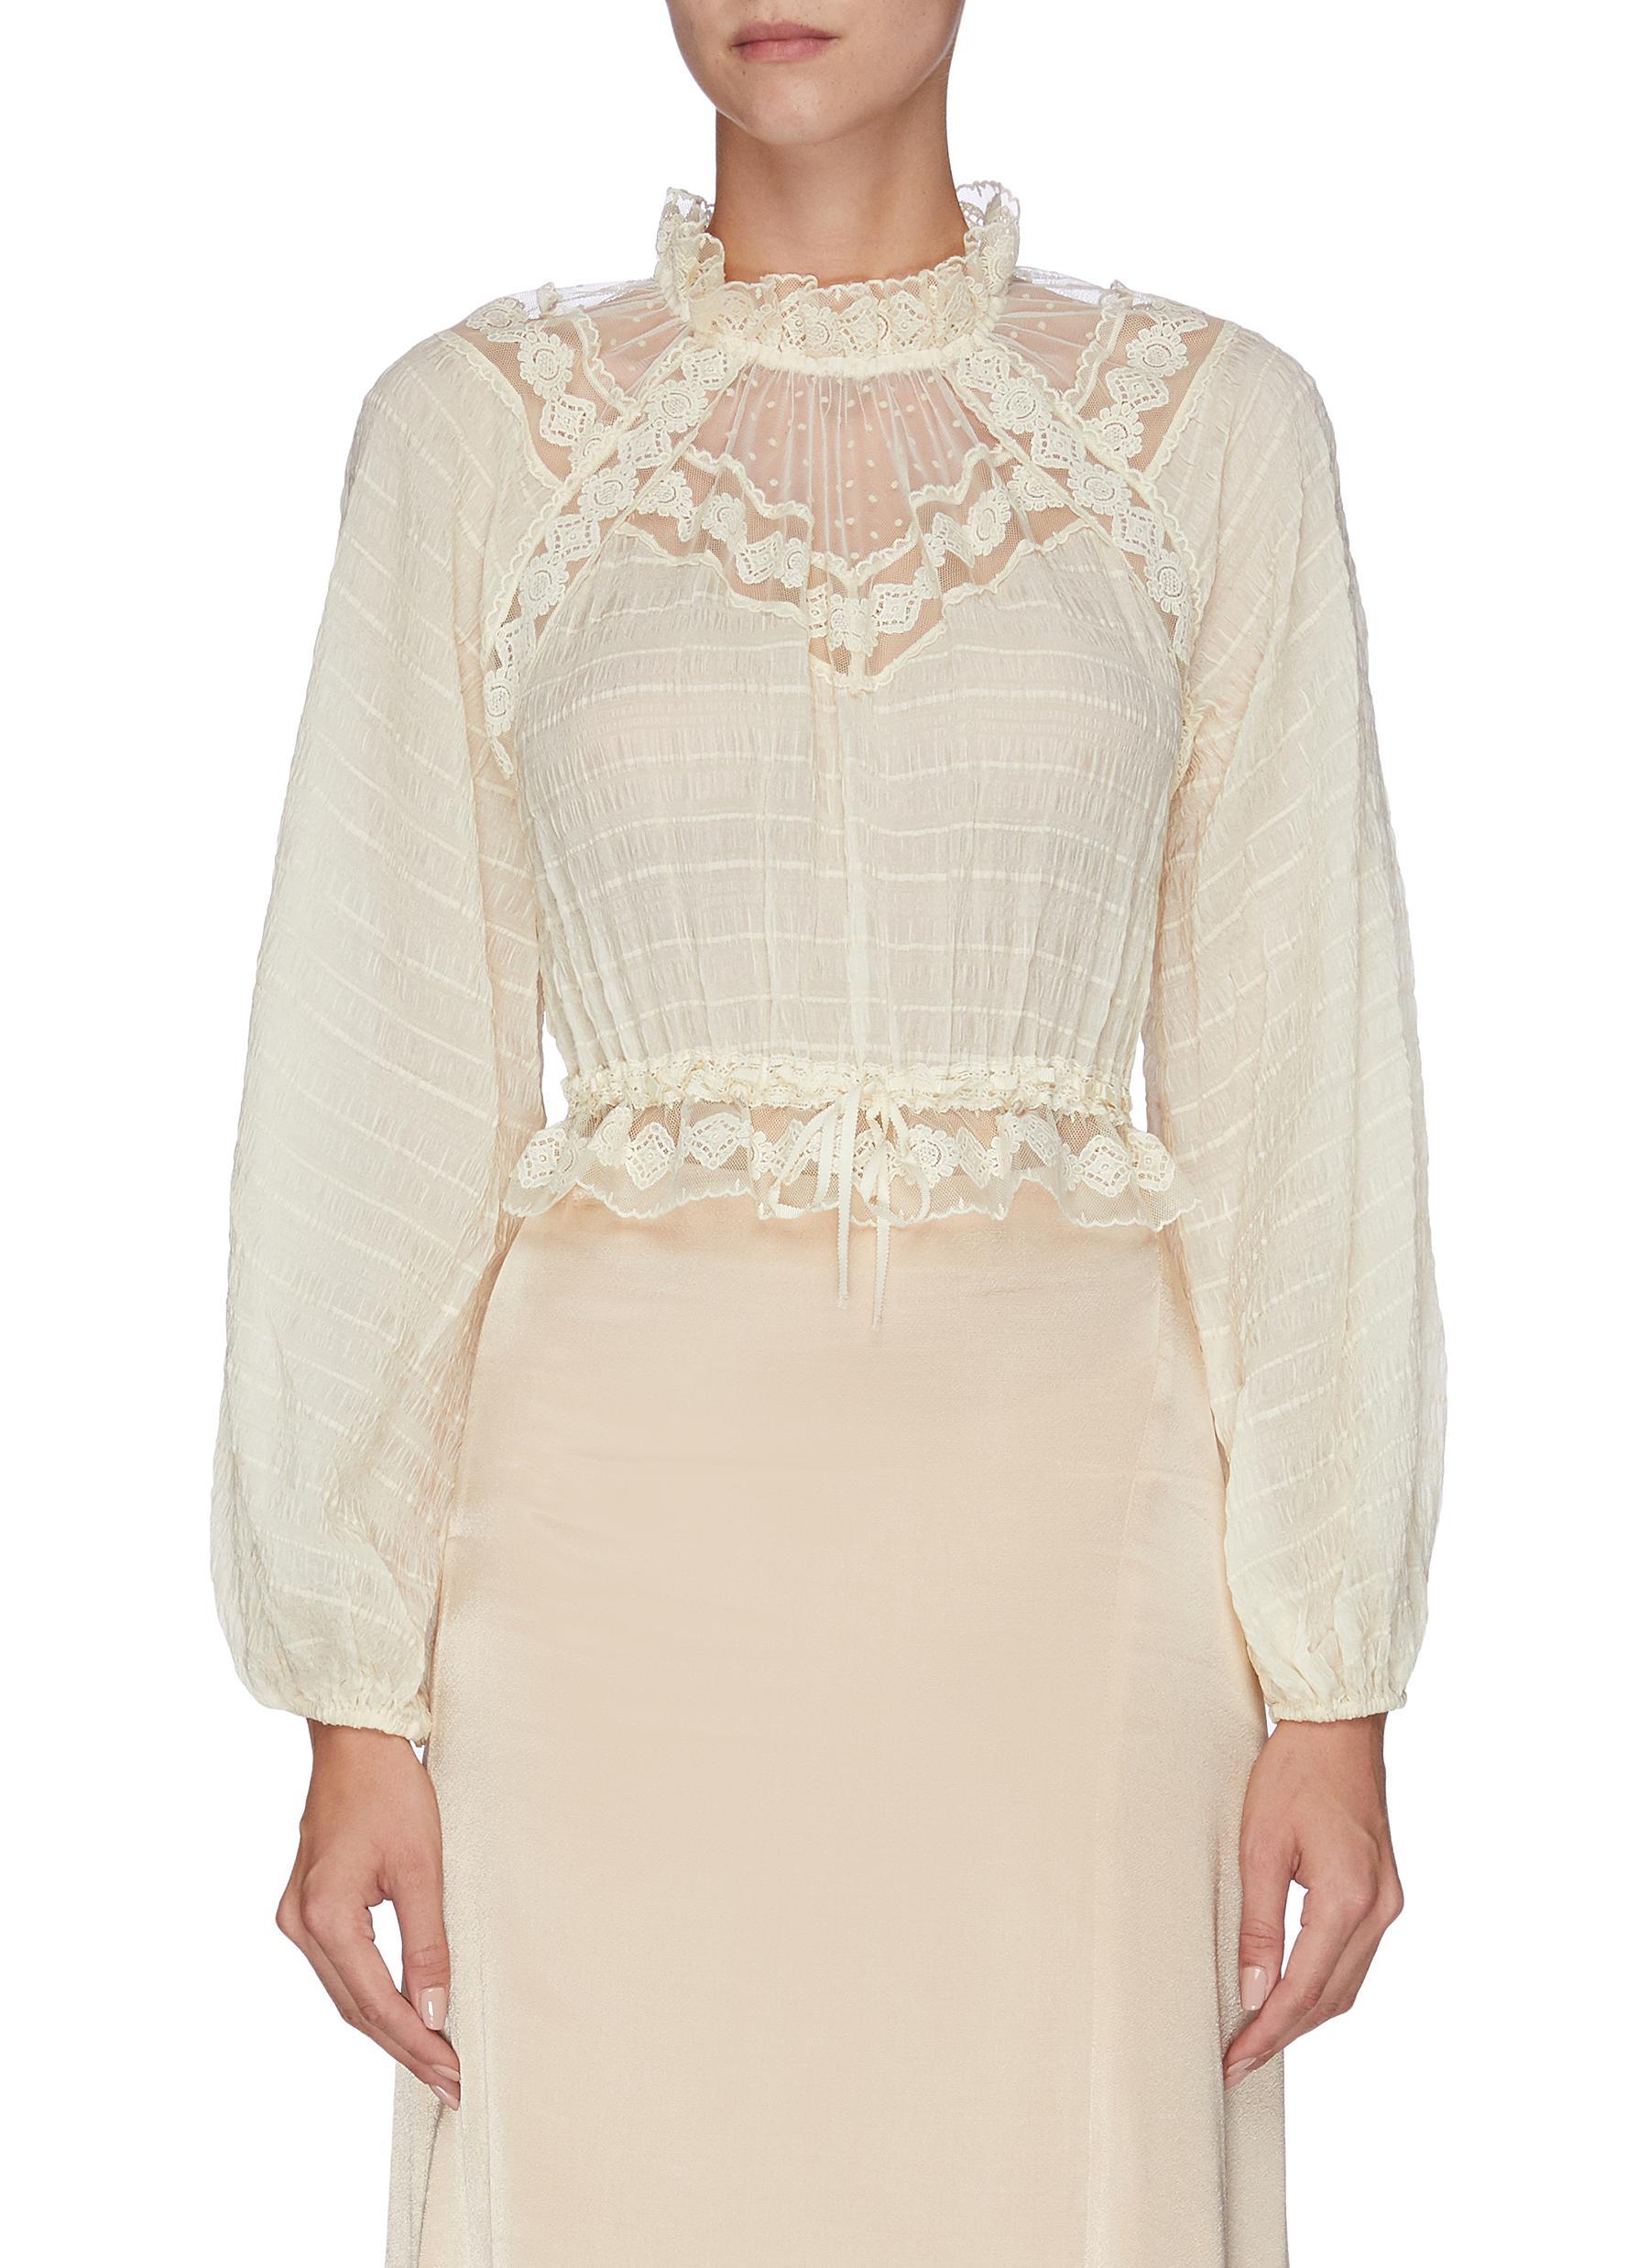 Sabotage laced lantern sleeve blouse by Zimmermann